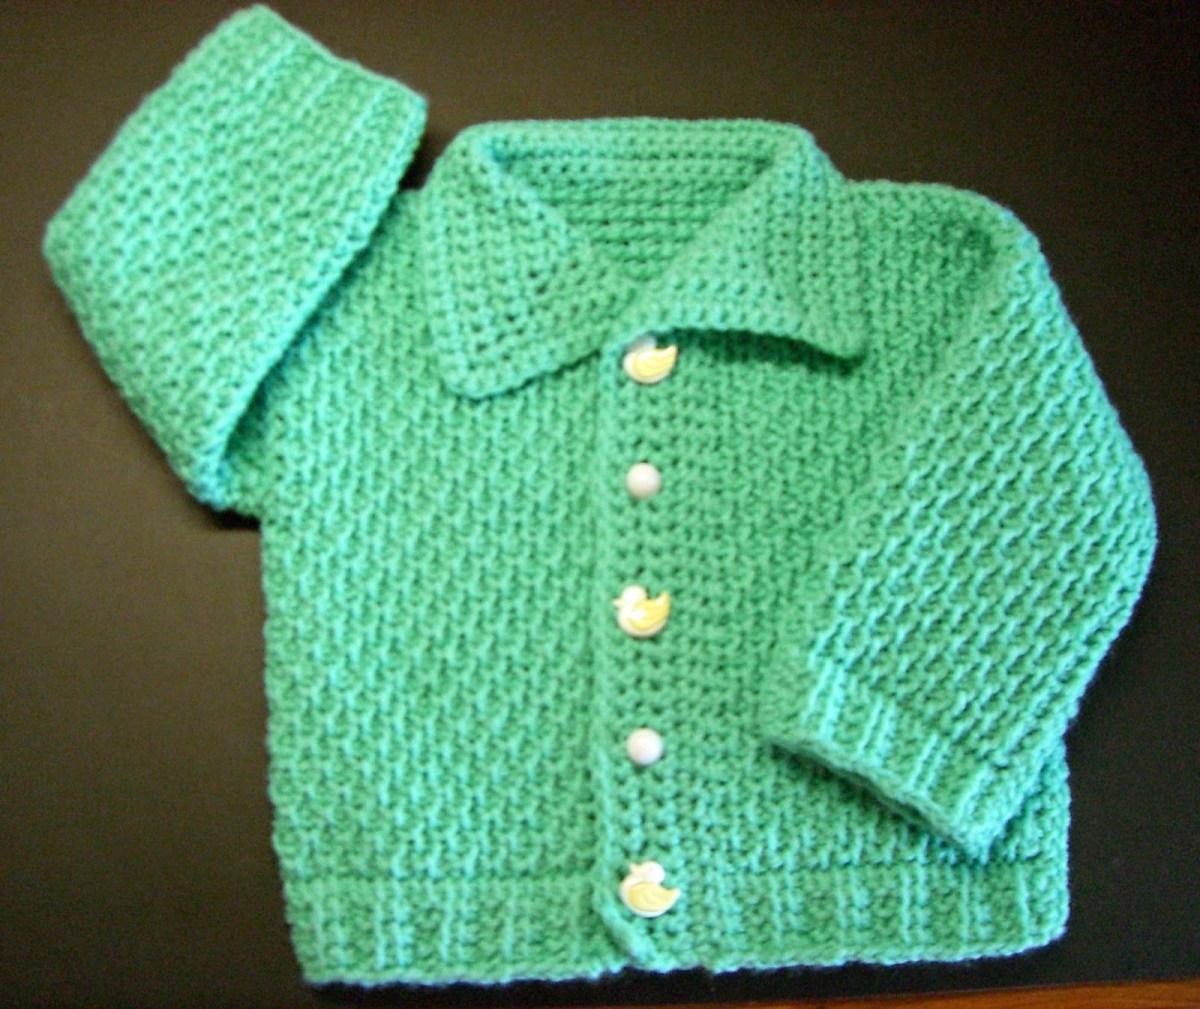 Crochet Baby Sweater Patterns Ayasha Cardigan Pattern Free Tunisian Crochet Pattern For Infants